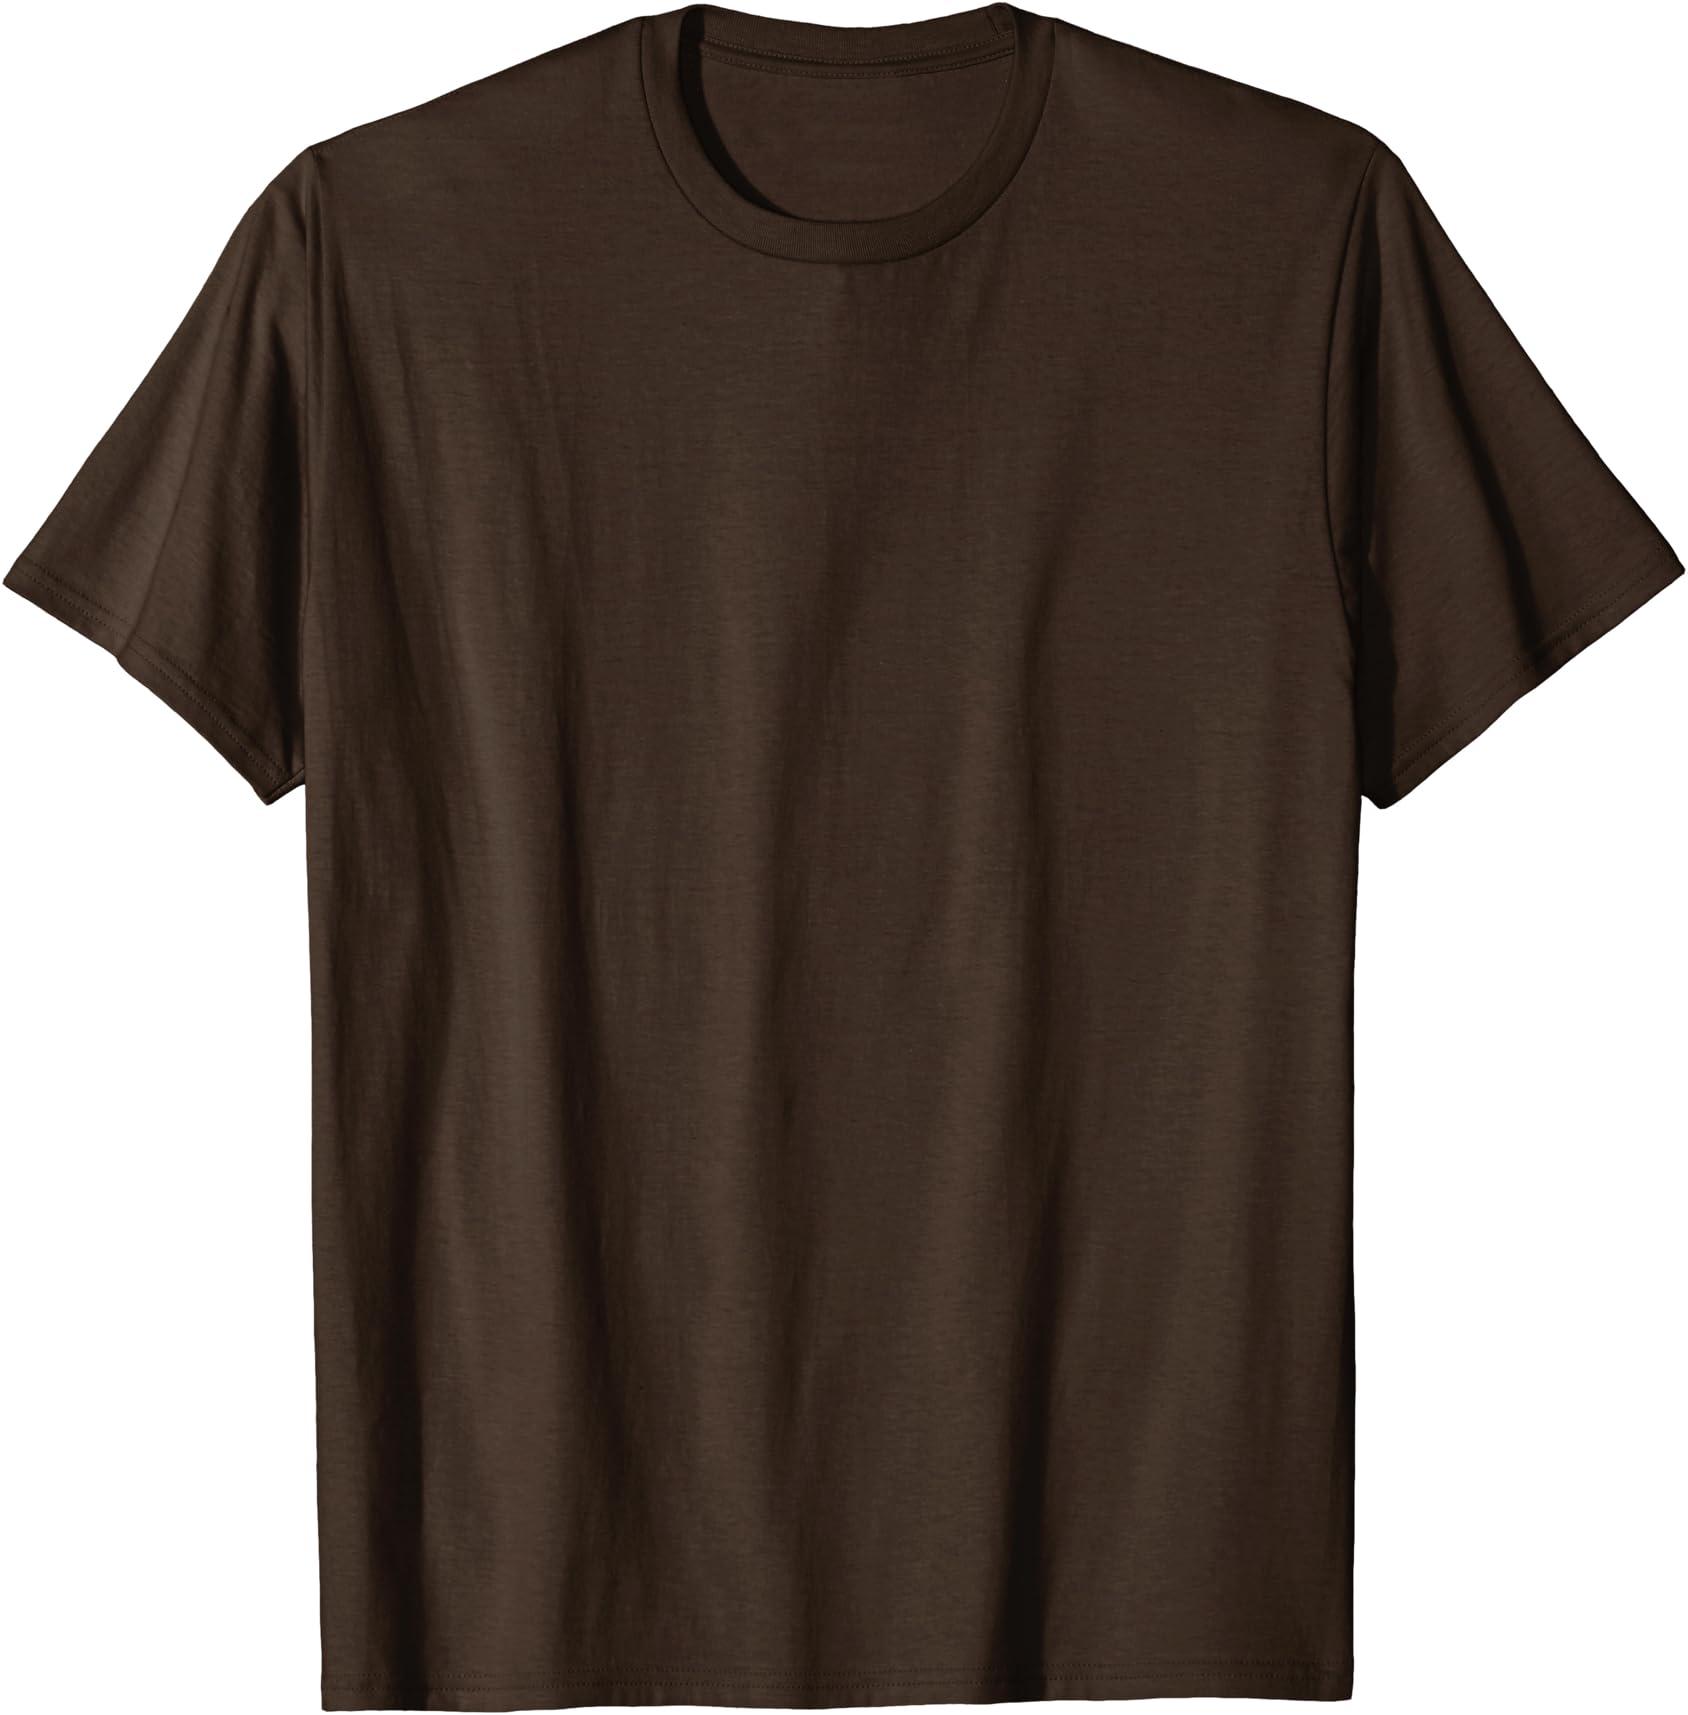 Cvcxvcxvcxvc Trolls Poppy Cotton Crew Neck Long Sleeve Graphic T-Shirt for Teens Boys Girls